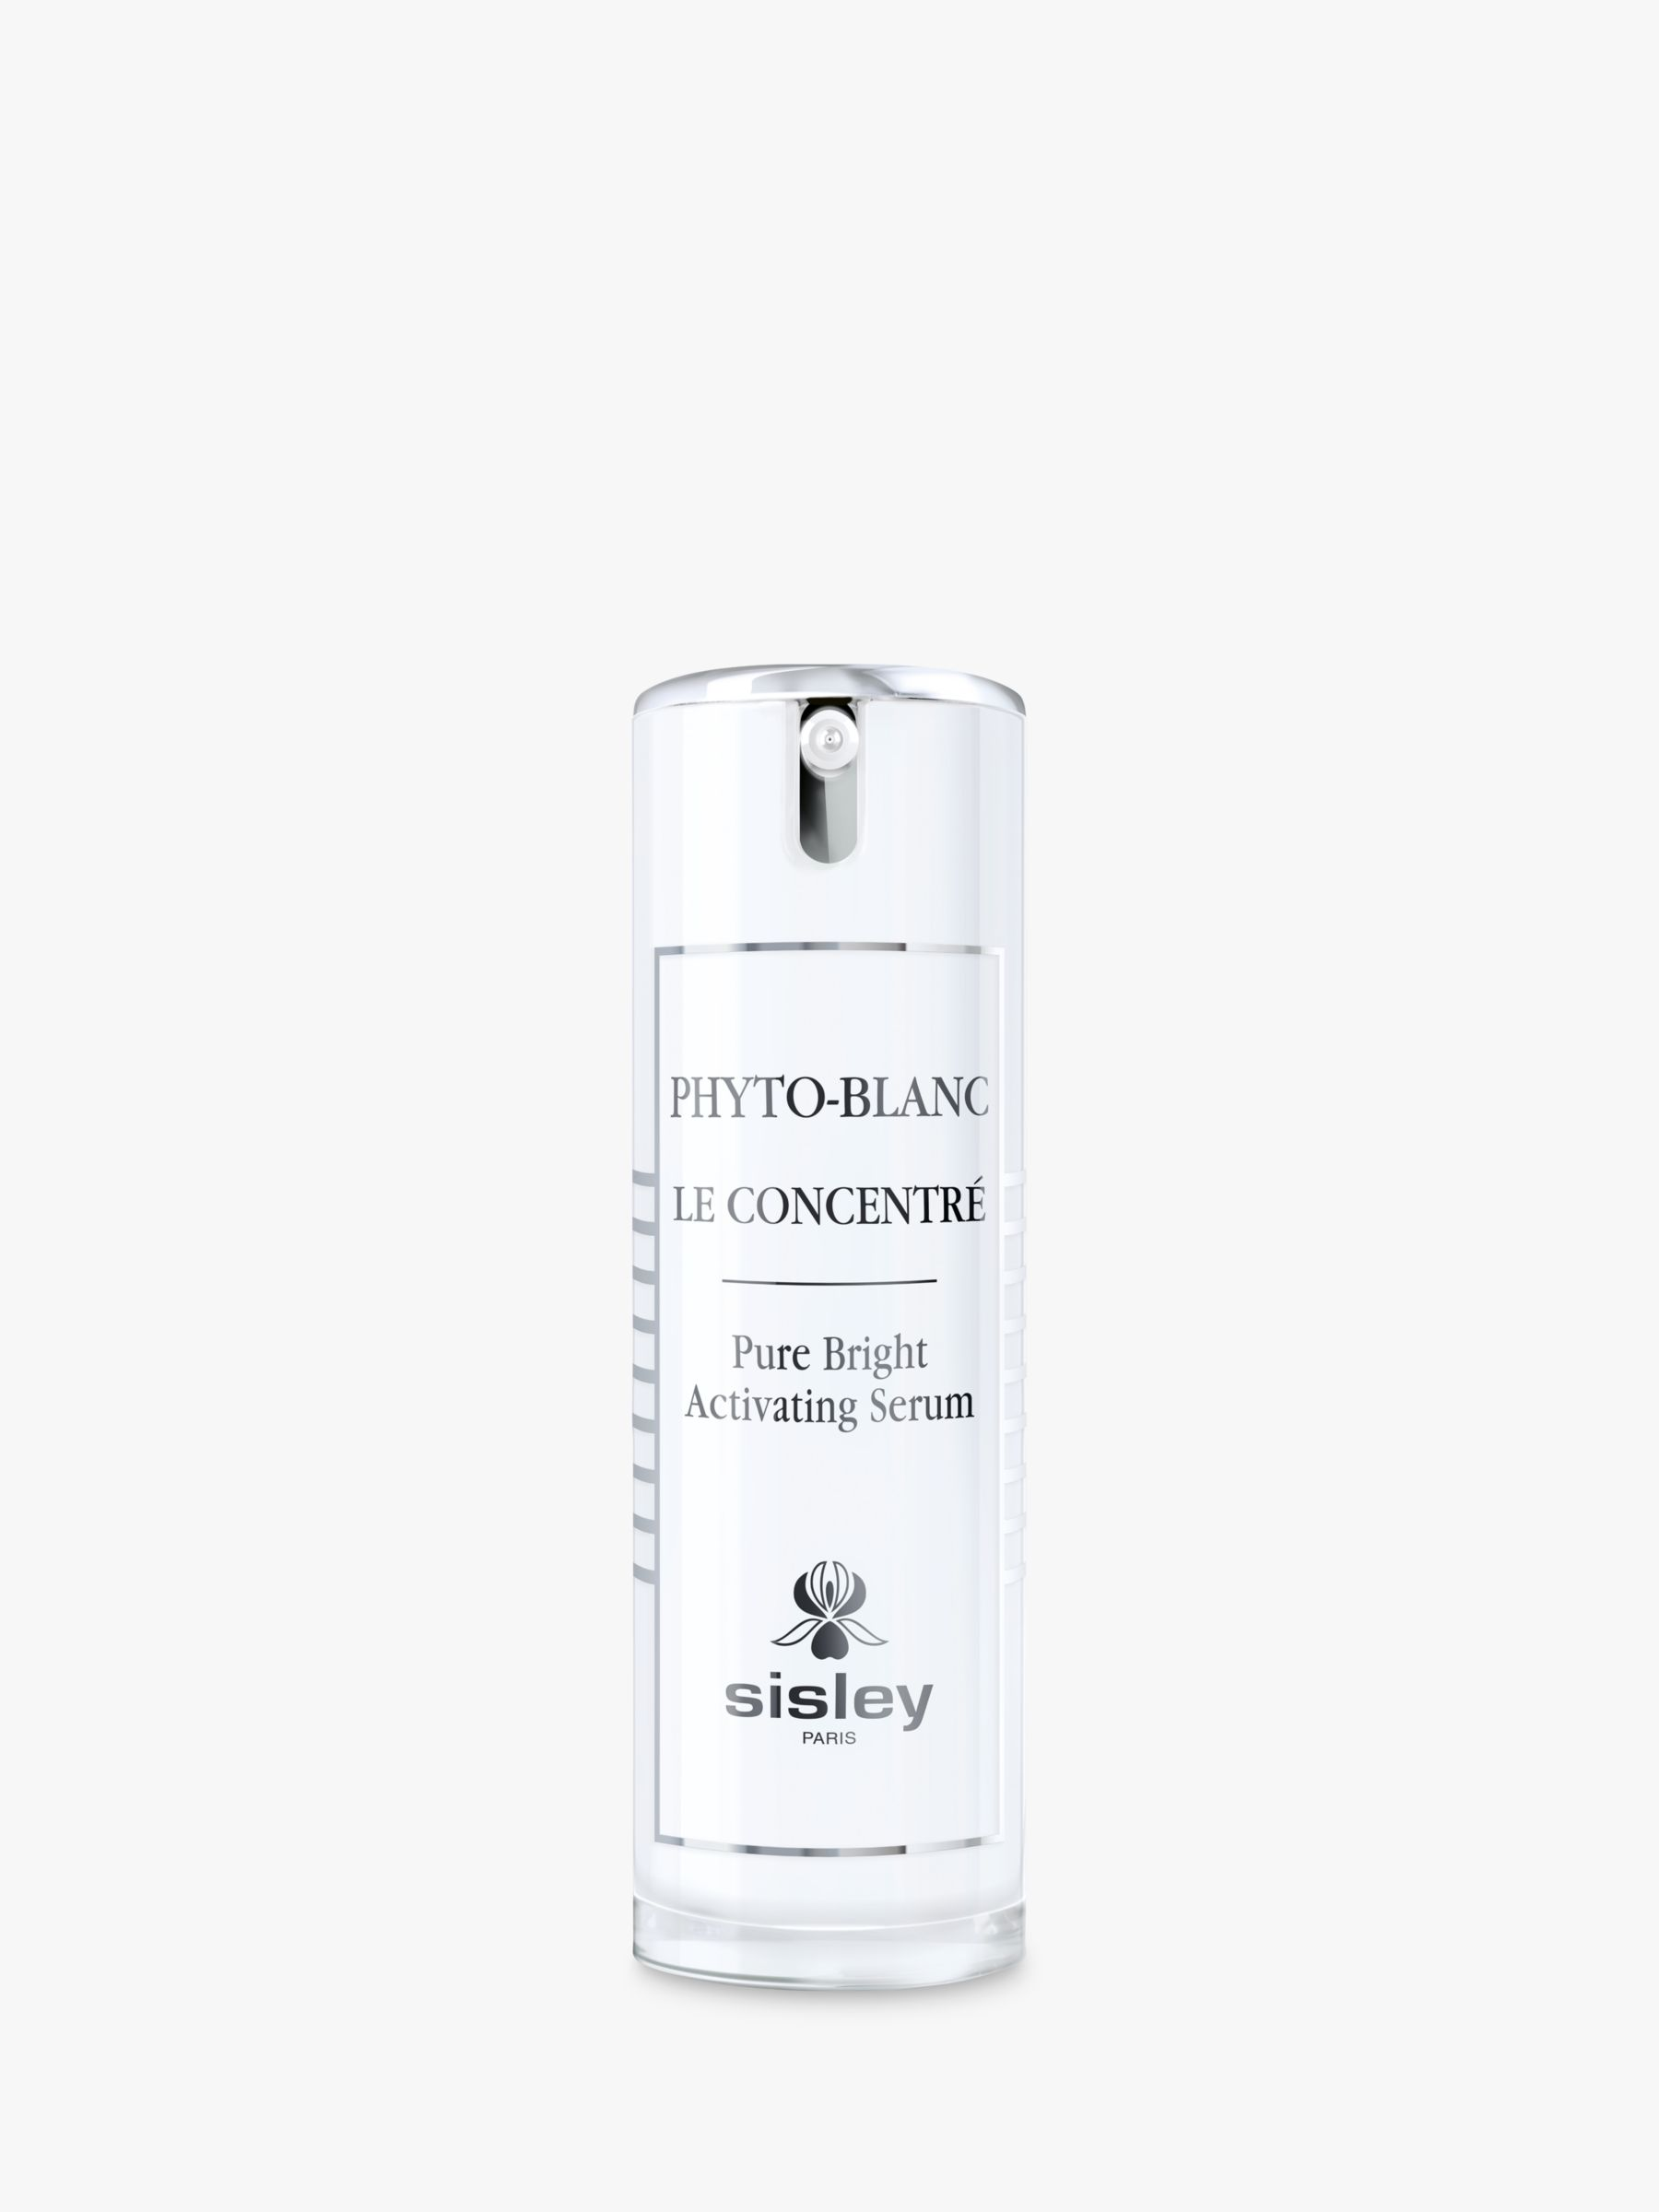 Sisley Sisley Phyto Blanc Le Concentré Pure Bright Activating Serum, 20ml